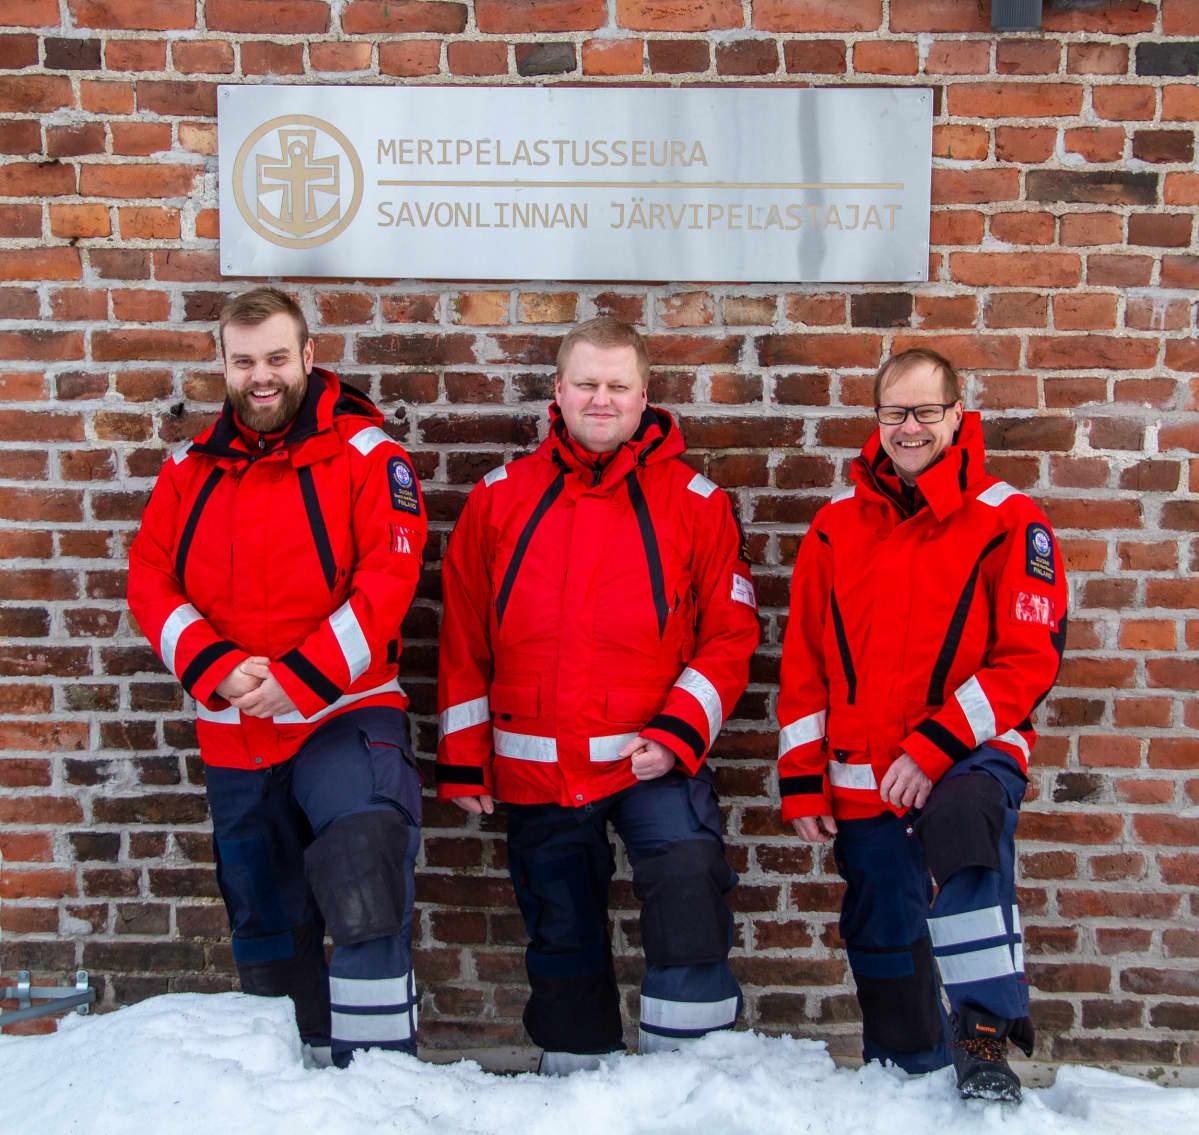 Savonlinnan Järvipelastajien pelastusvene Uuraan miehistö: Mikael Fyhr, Martin Lajunen ja Esa Hirvonen